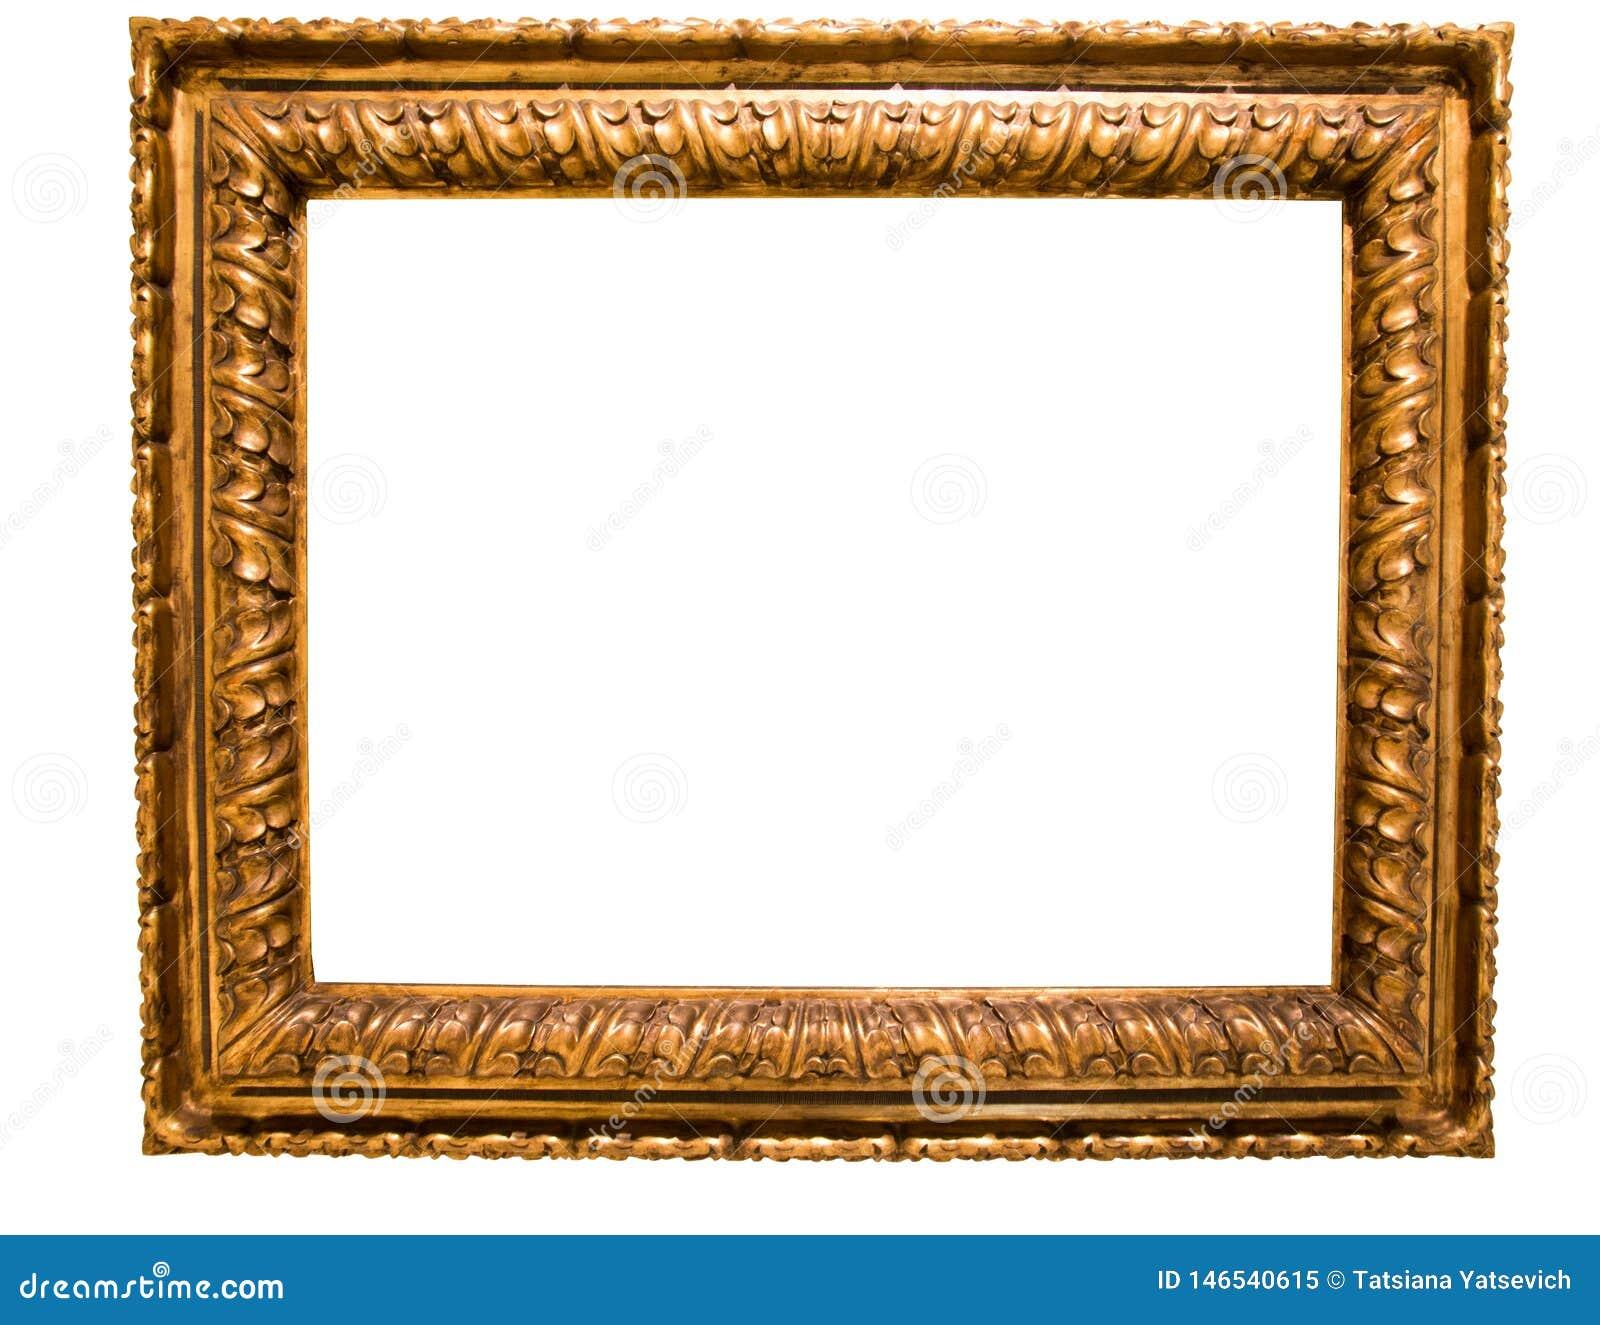 Marco rectangular de oro retro para la fotograf?a en fondo aislado